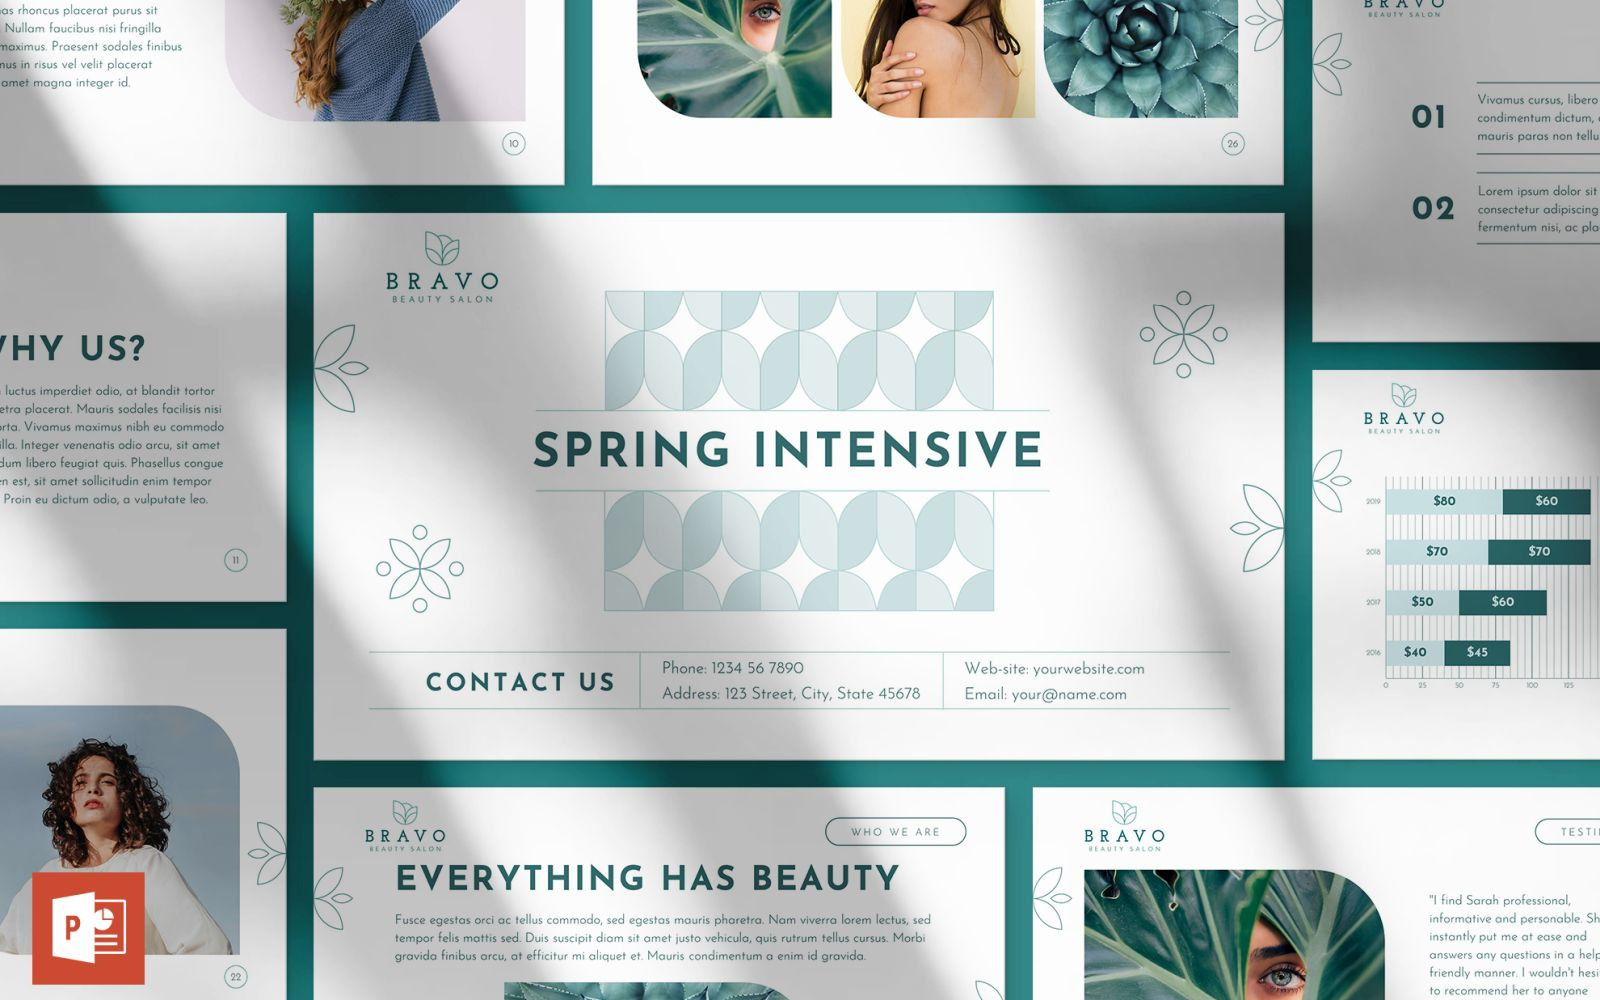 Beauty Salon Presentation PowerPoint Template